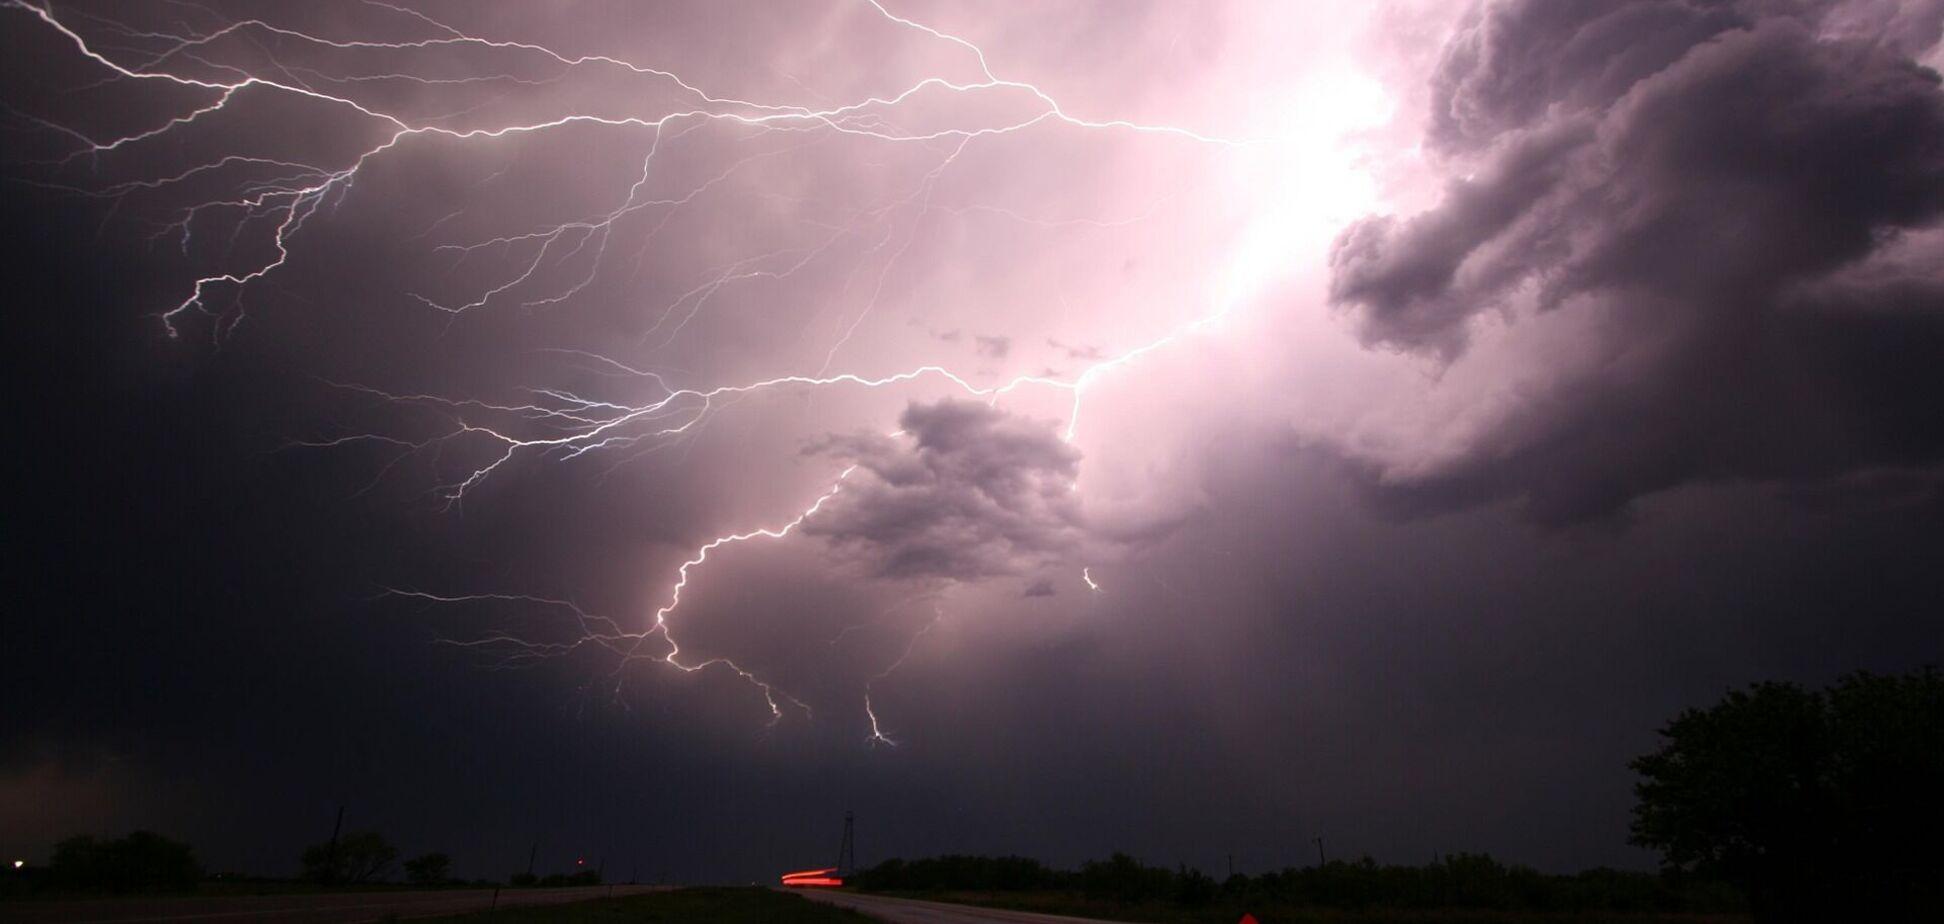 Синоптики спрогнозировали дожди с грозами на 14 августа. Фото Pixabay